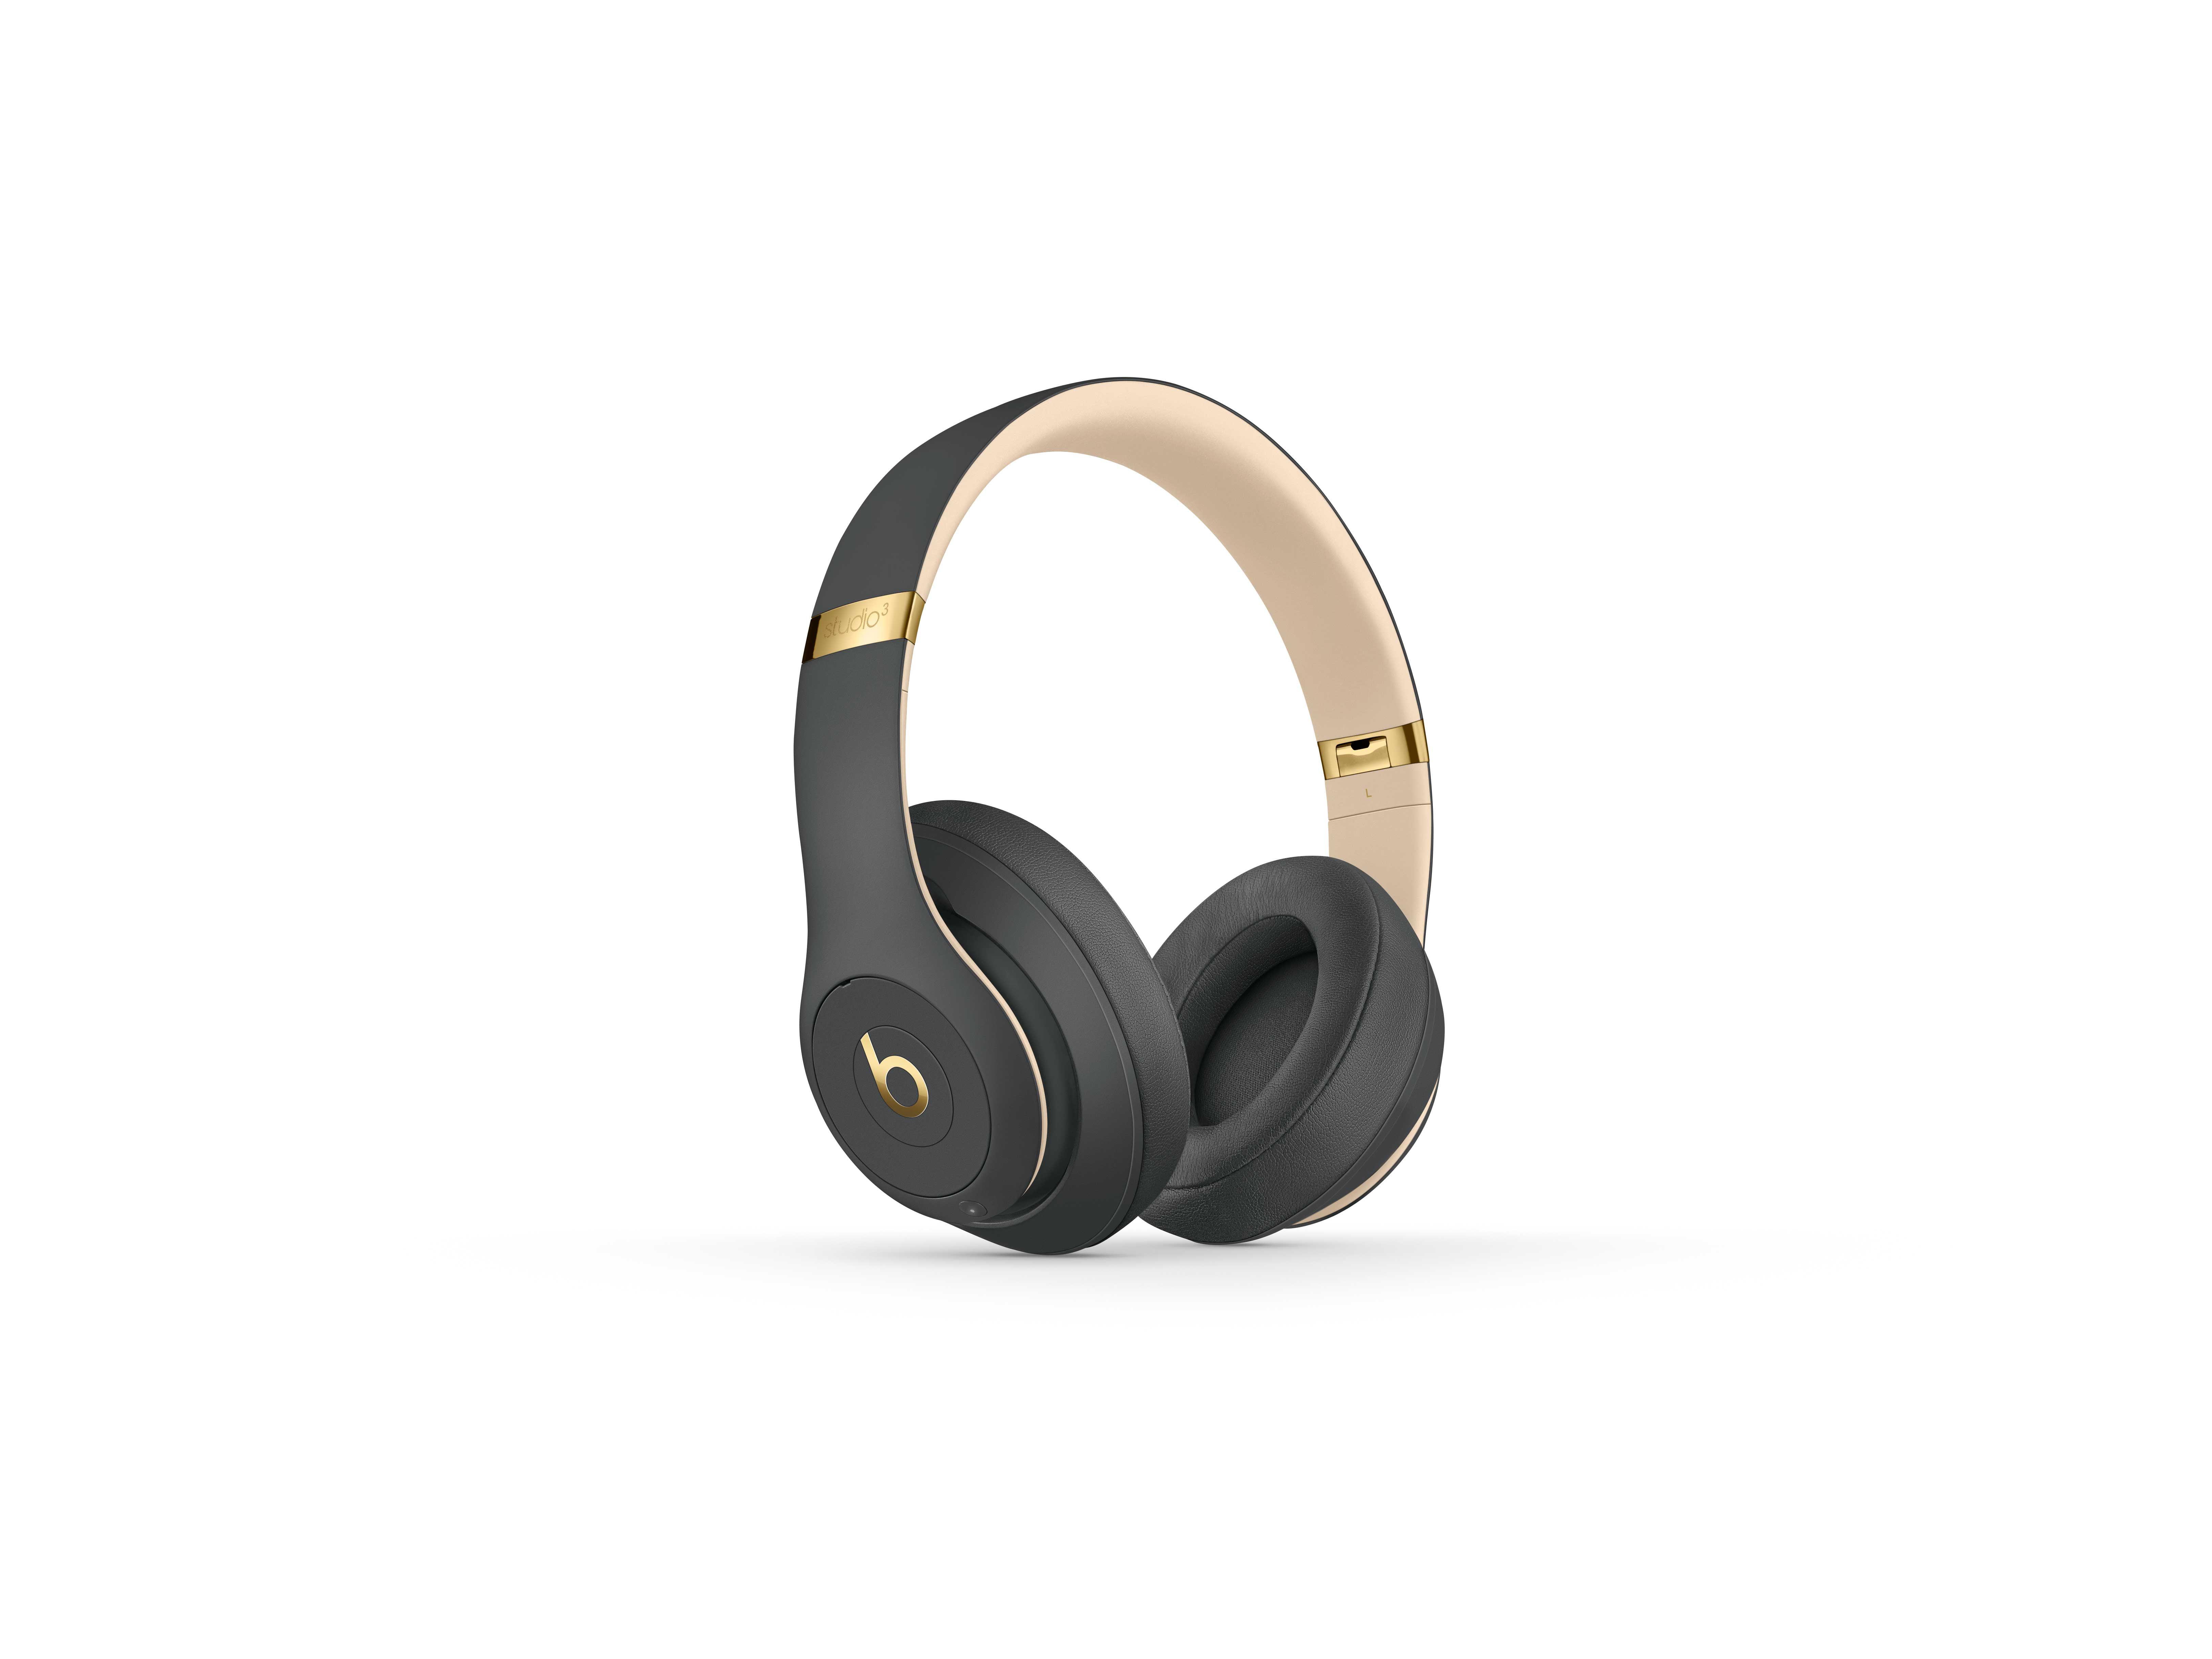 Beats Studio3 Wireless Headphones The Beats Skyline Collection Shadow Gray Walmart Com Walmart Com